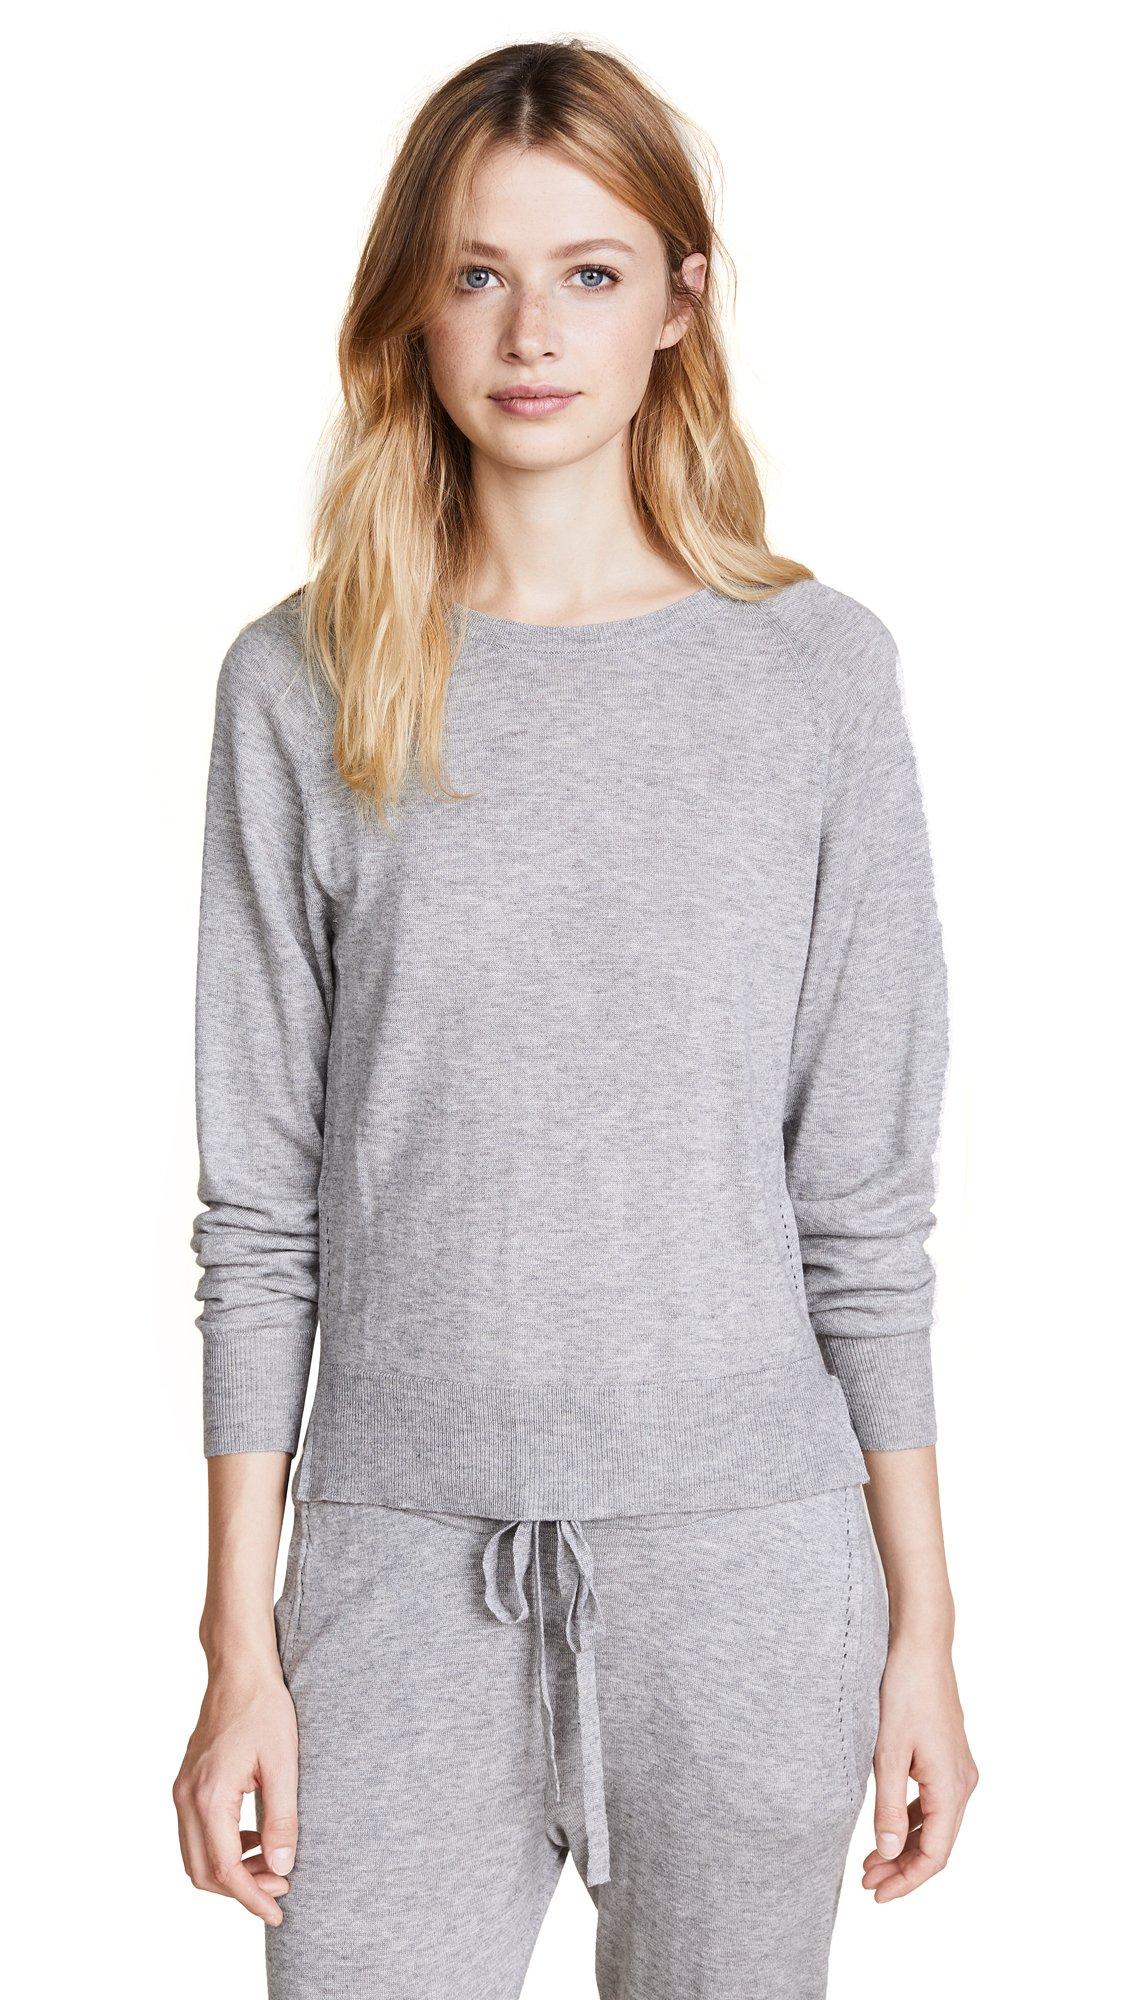 Skin Women's Melina Top, Grey, 1